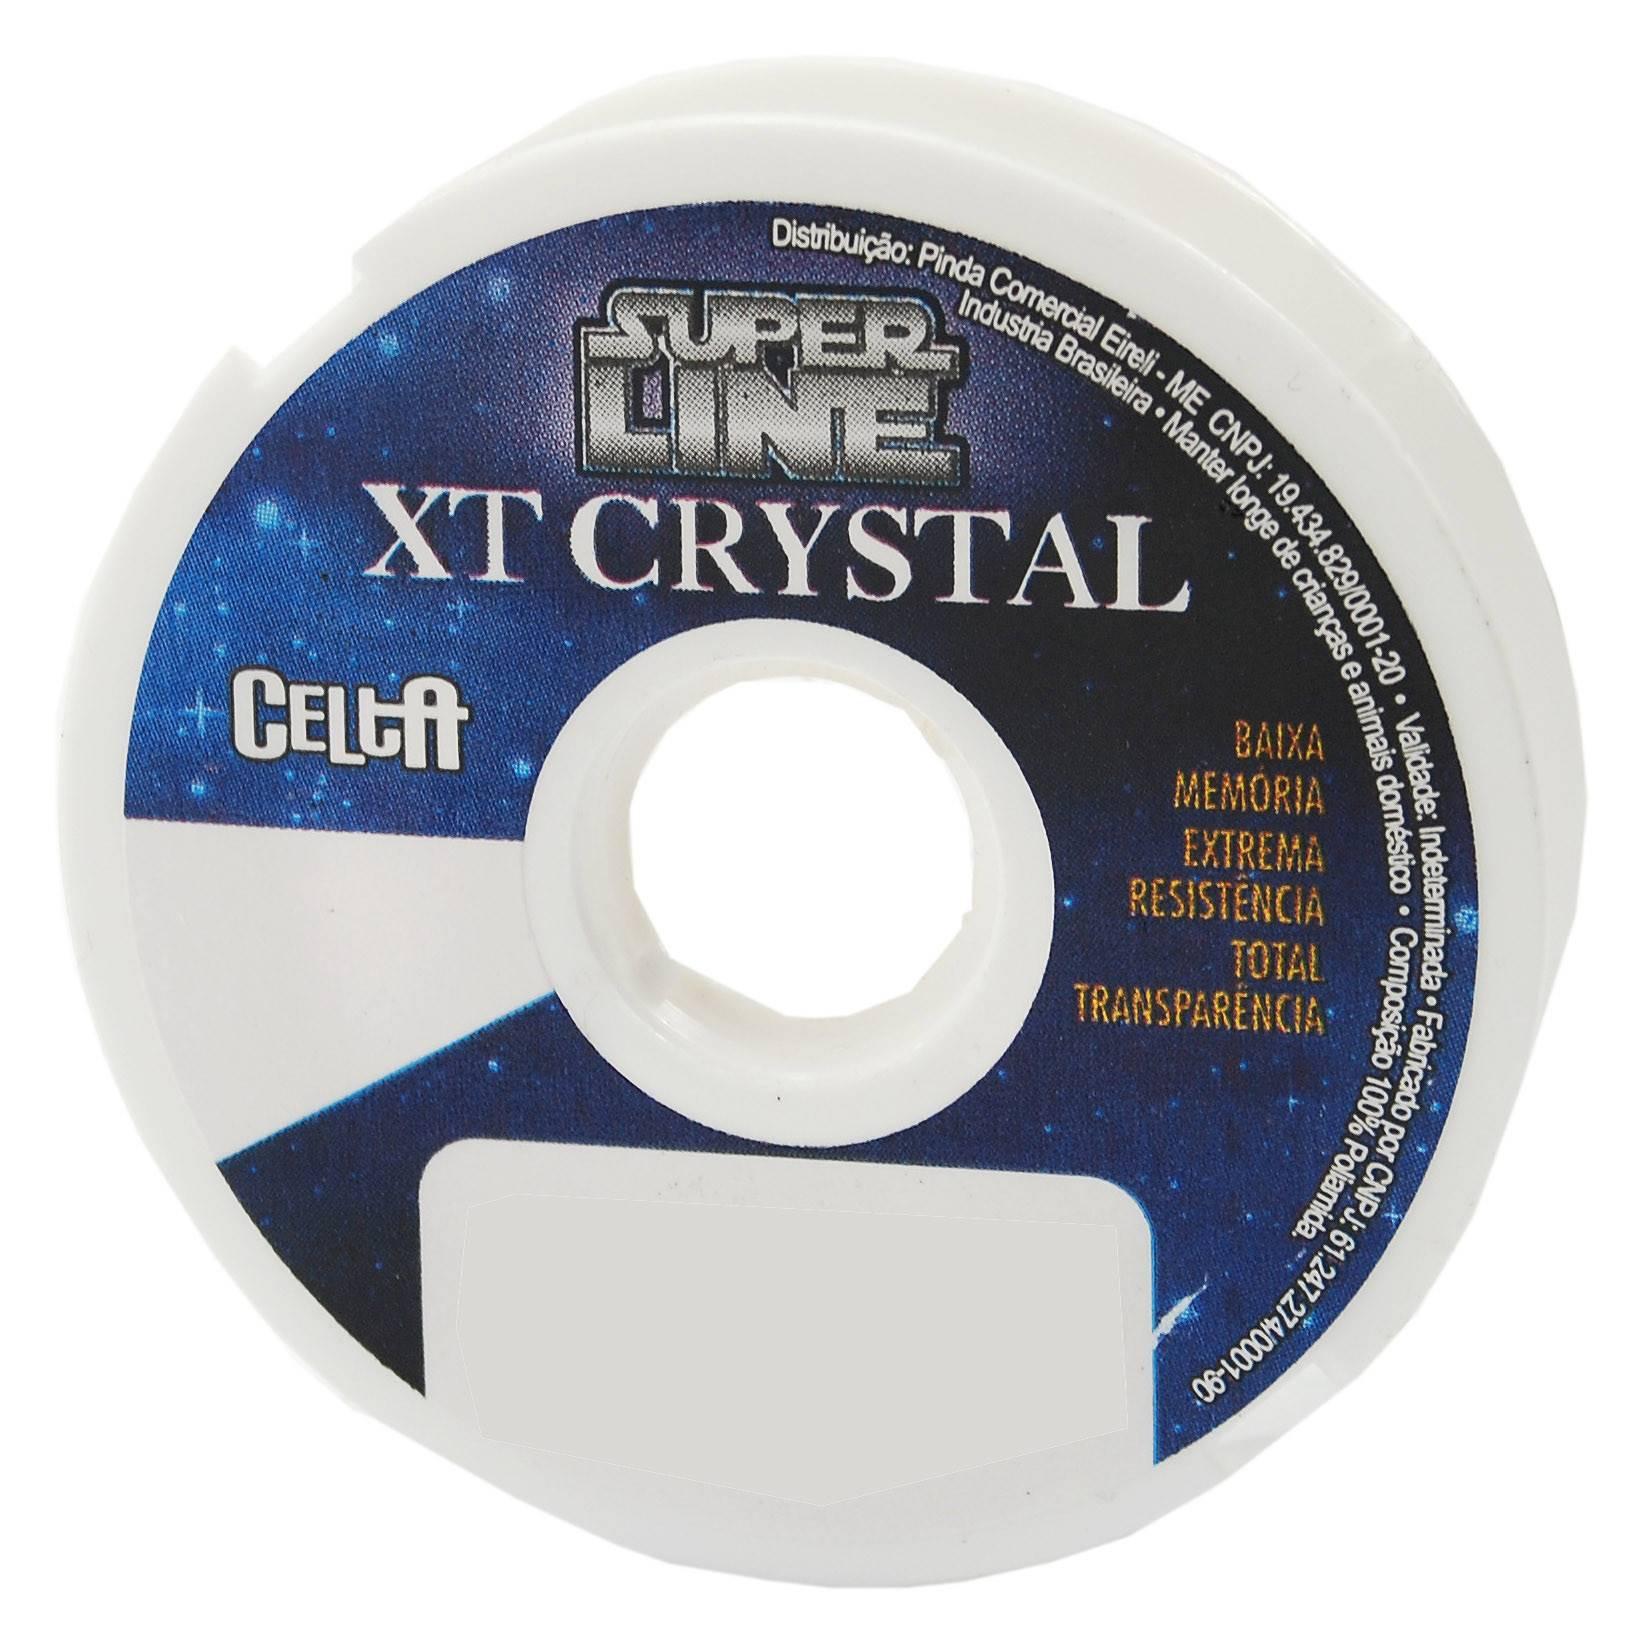 Linha Mono Celta XT Crystal e Titanium 0,35mm 19,2lbs/8,7kg - 120 Metros